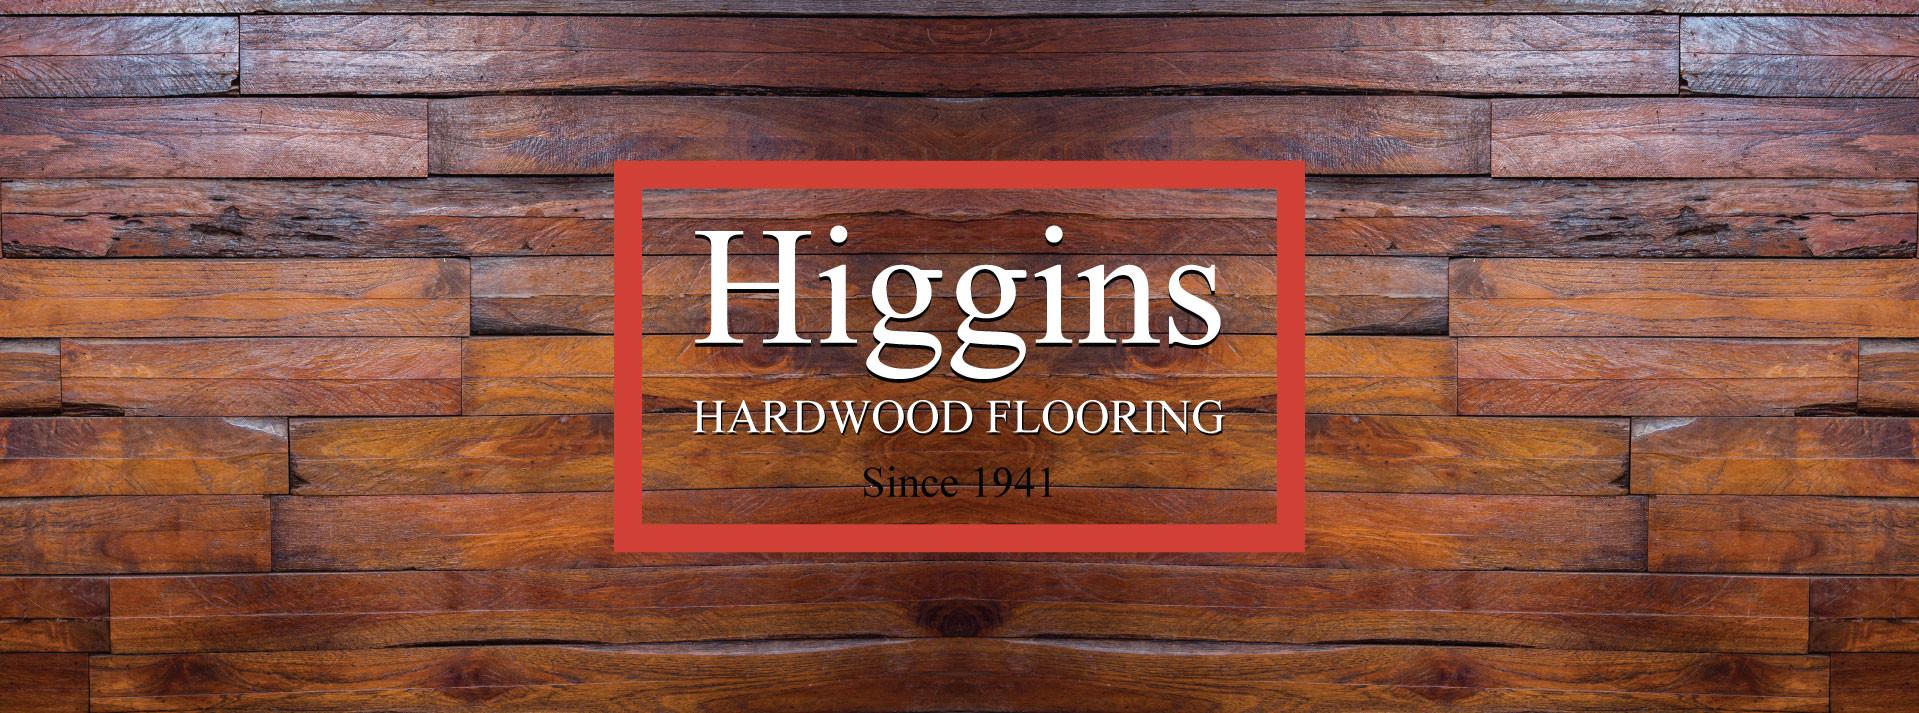 expert hardwood flooring ontario ca of higgins hardwood flooring in peterborough oshawa lindsay ajax in office hours